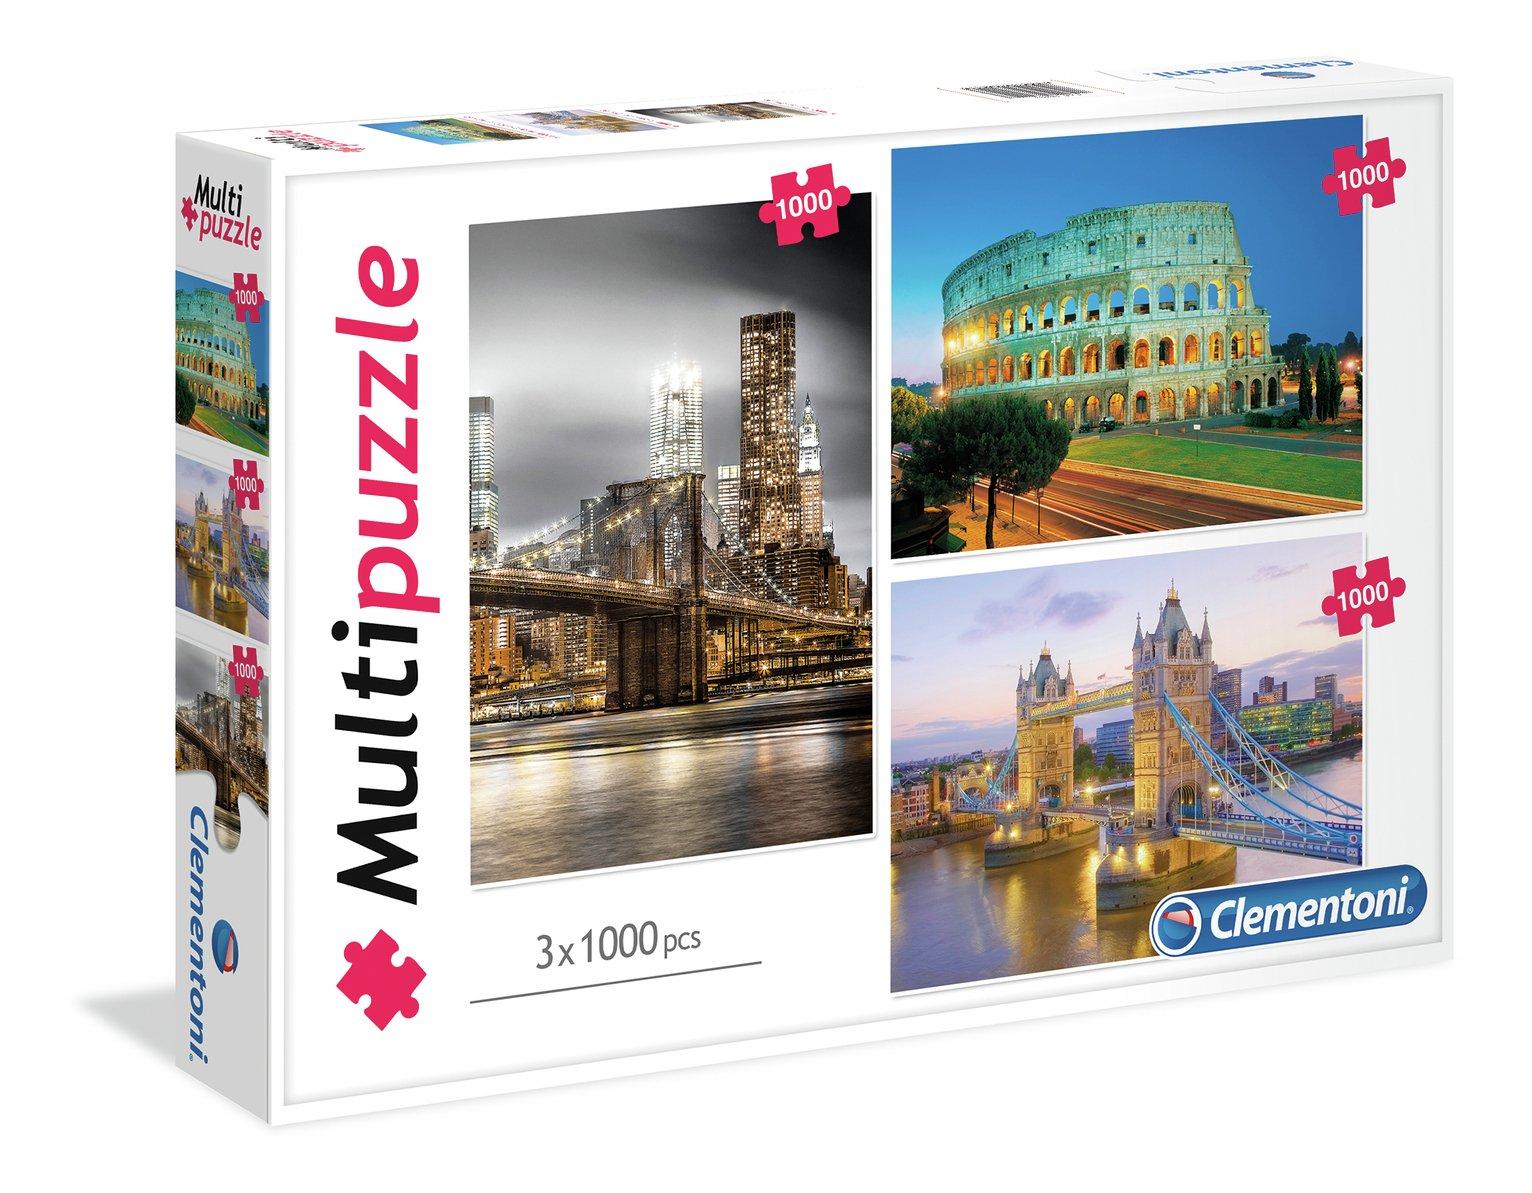 Clementoni 1000 Piece City Mega Jigsaw Puzzle - Set of 3